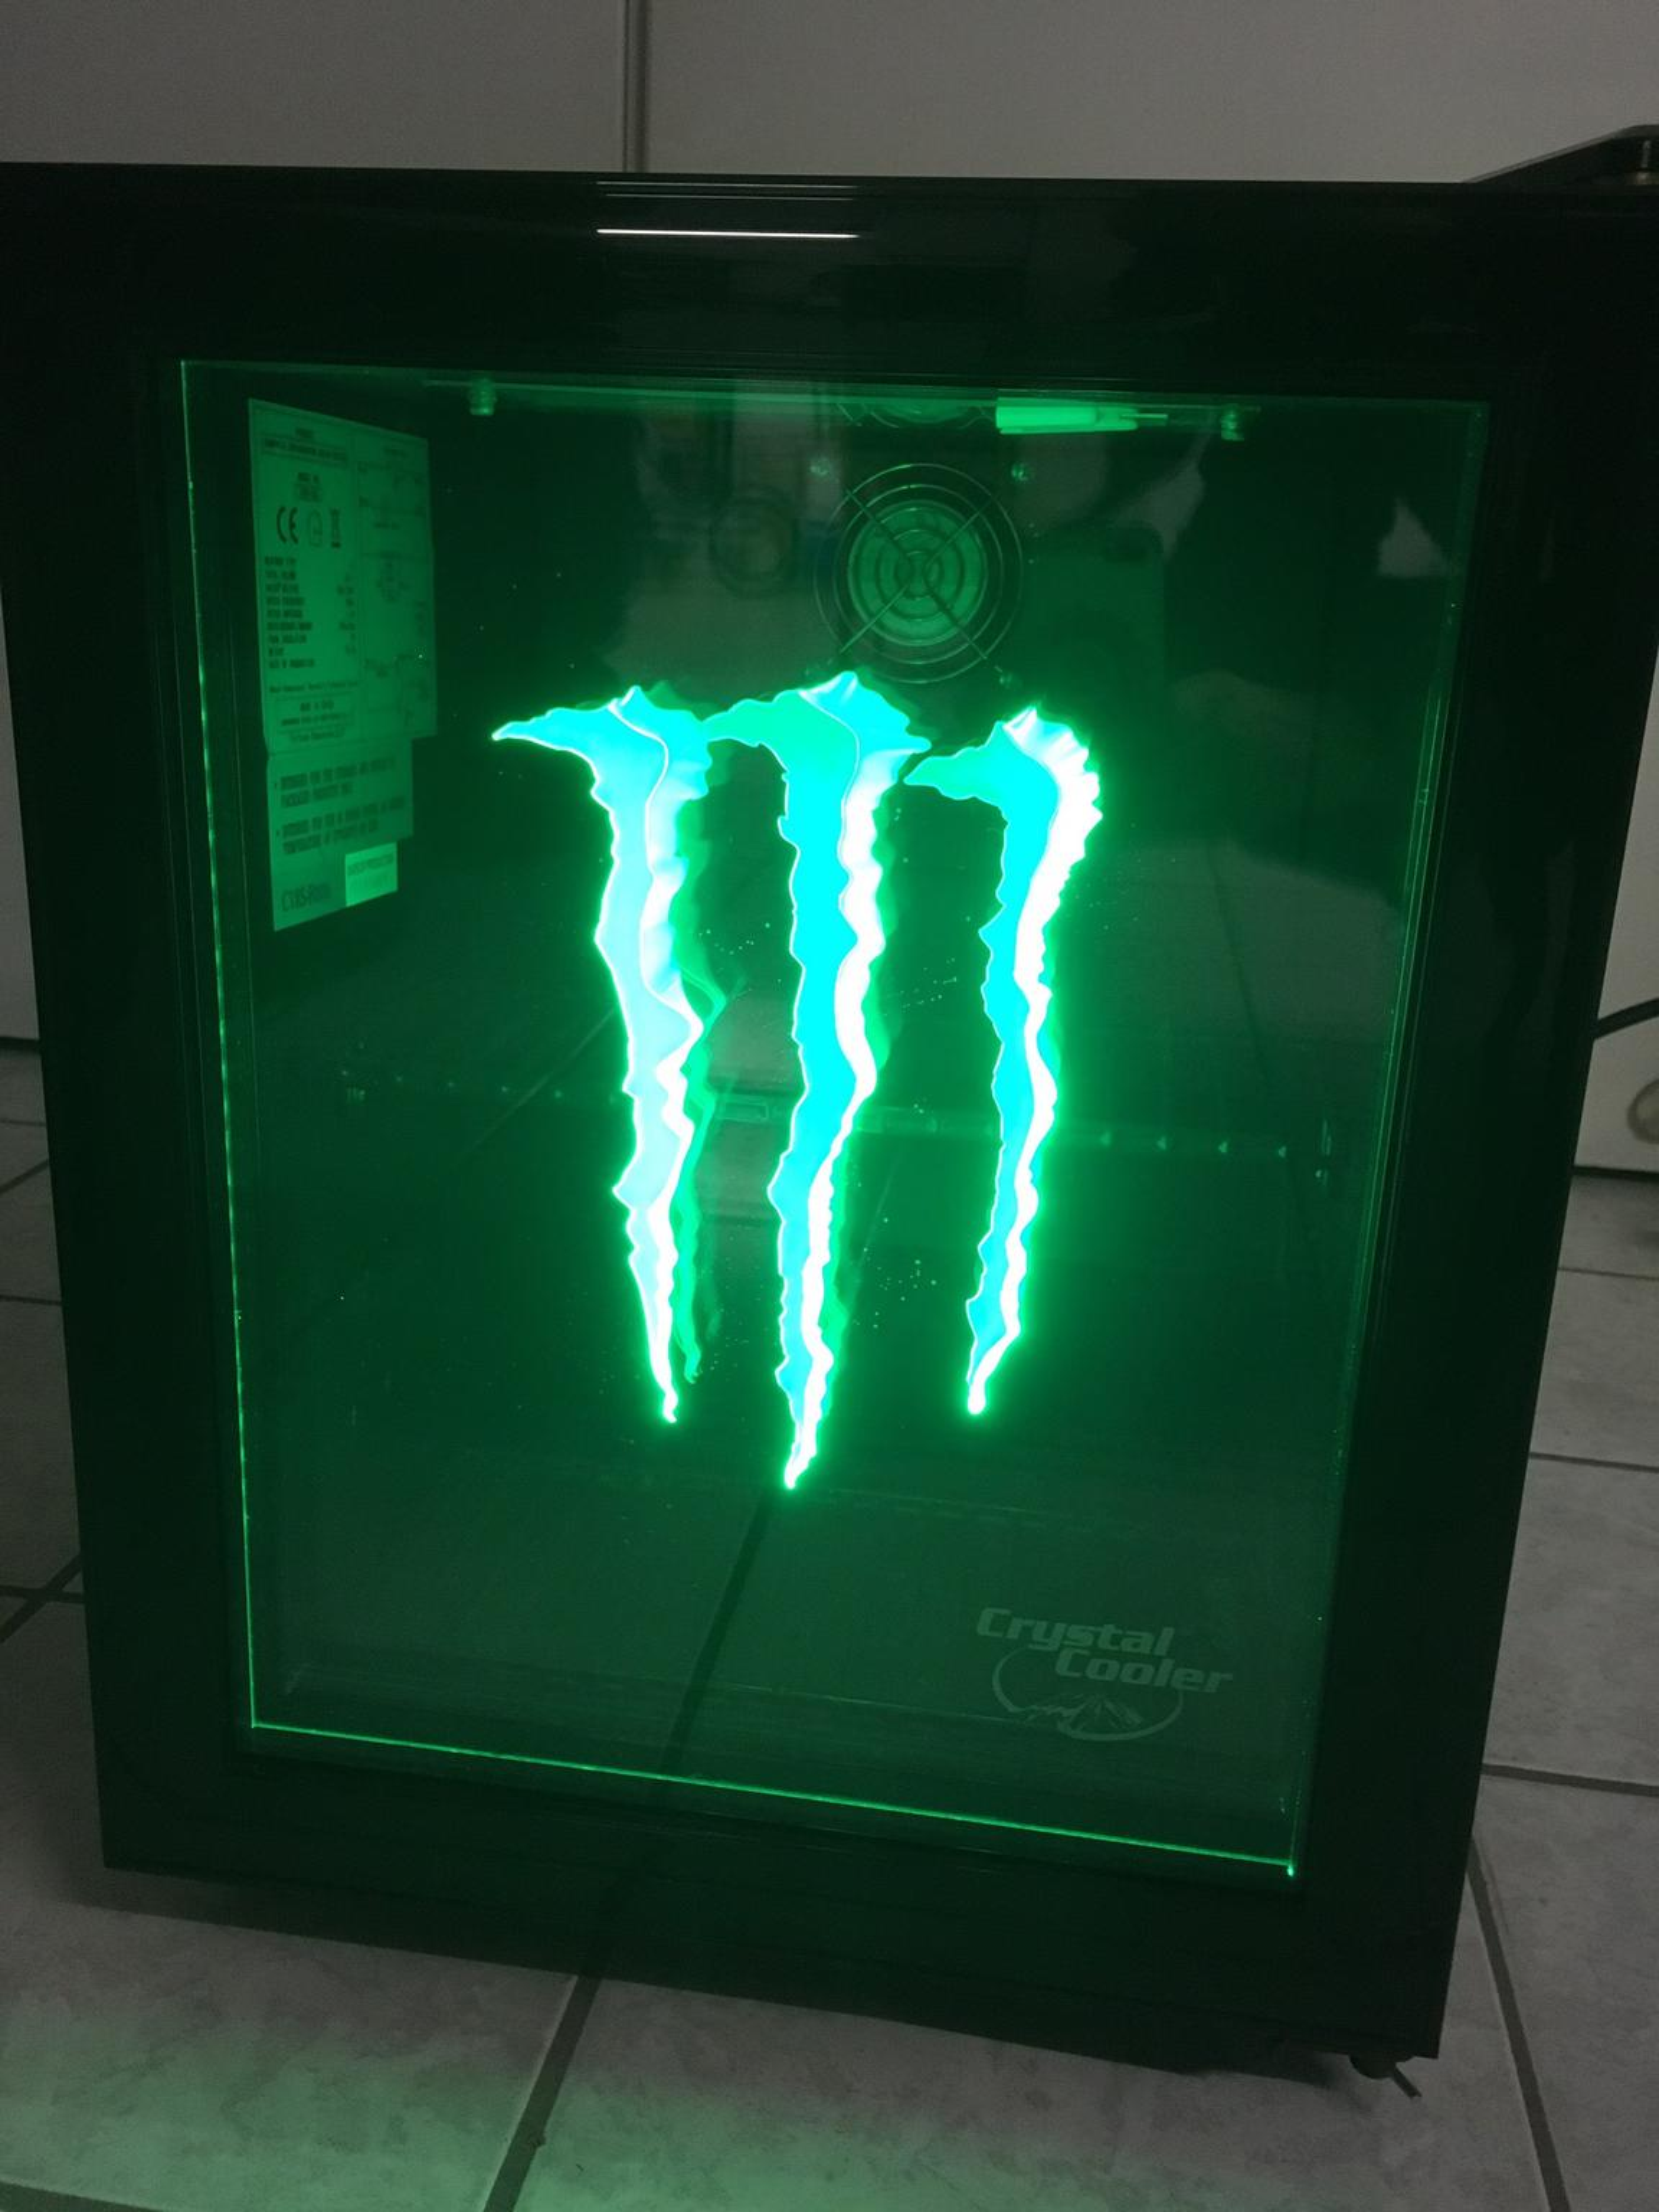 Mini Kühlschrank Monster Energy Kaufen : Gebraucht monster energy kühlschrank in hall in tirol um